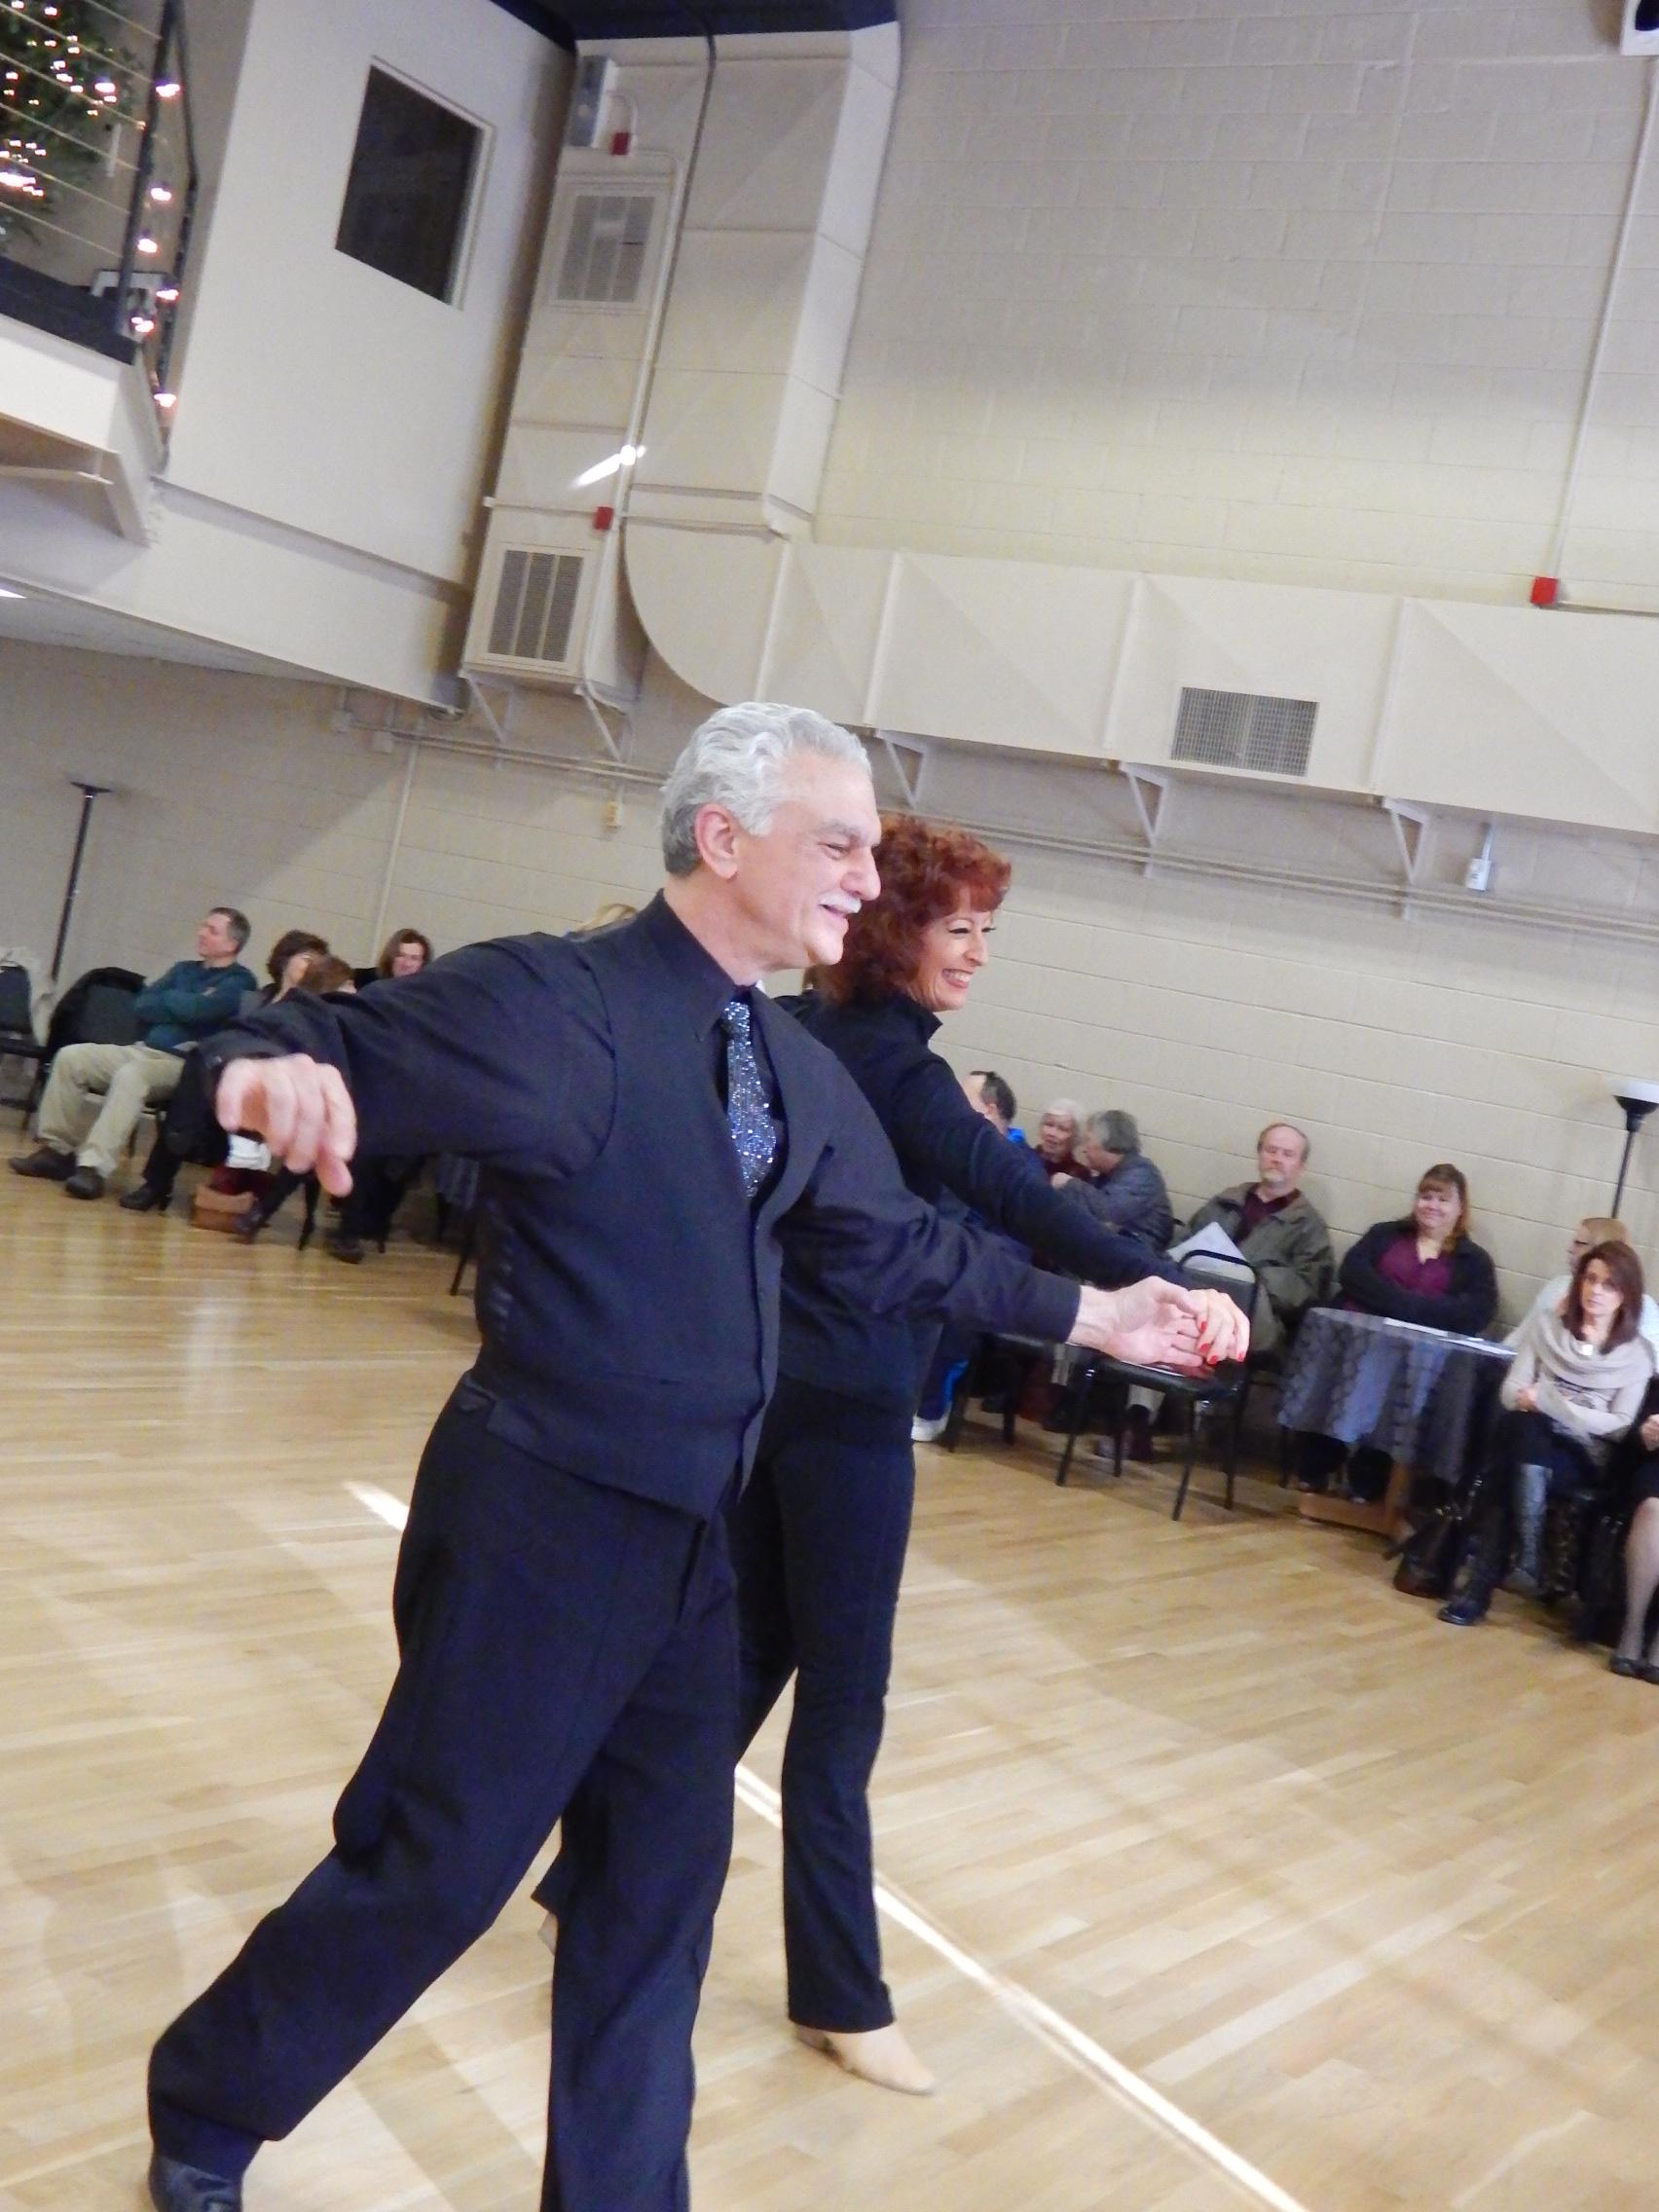 Ballroom, Warwick, RI, Showcase, Practice, Social